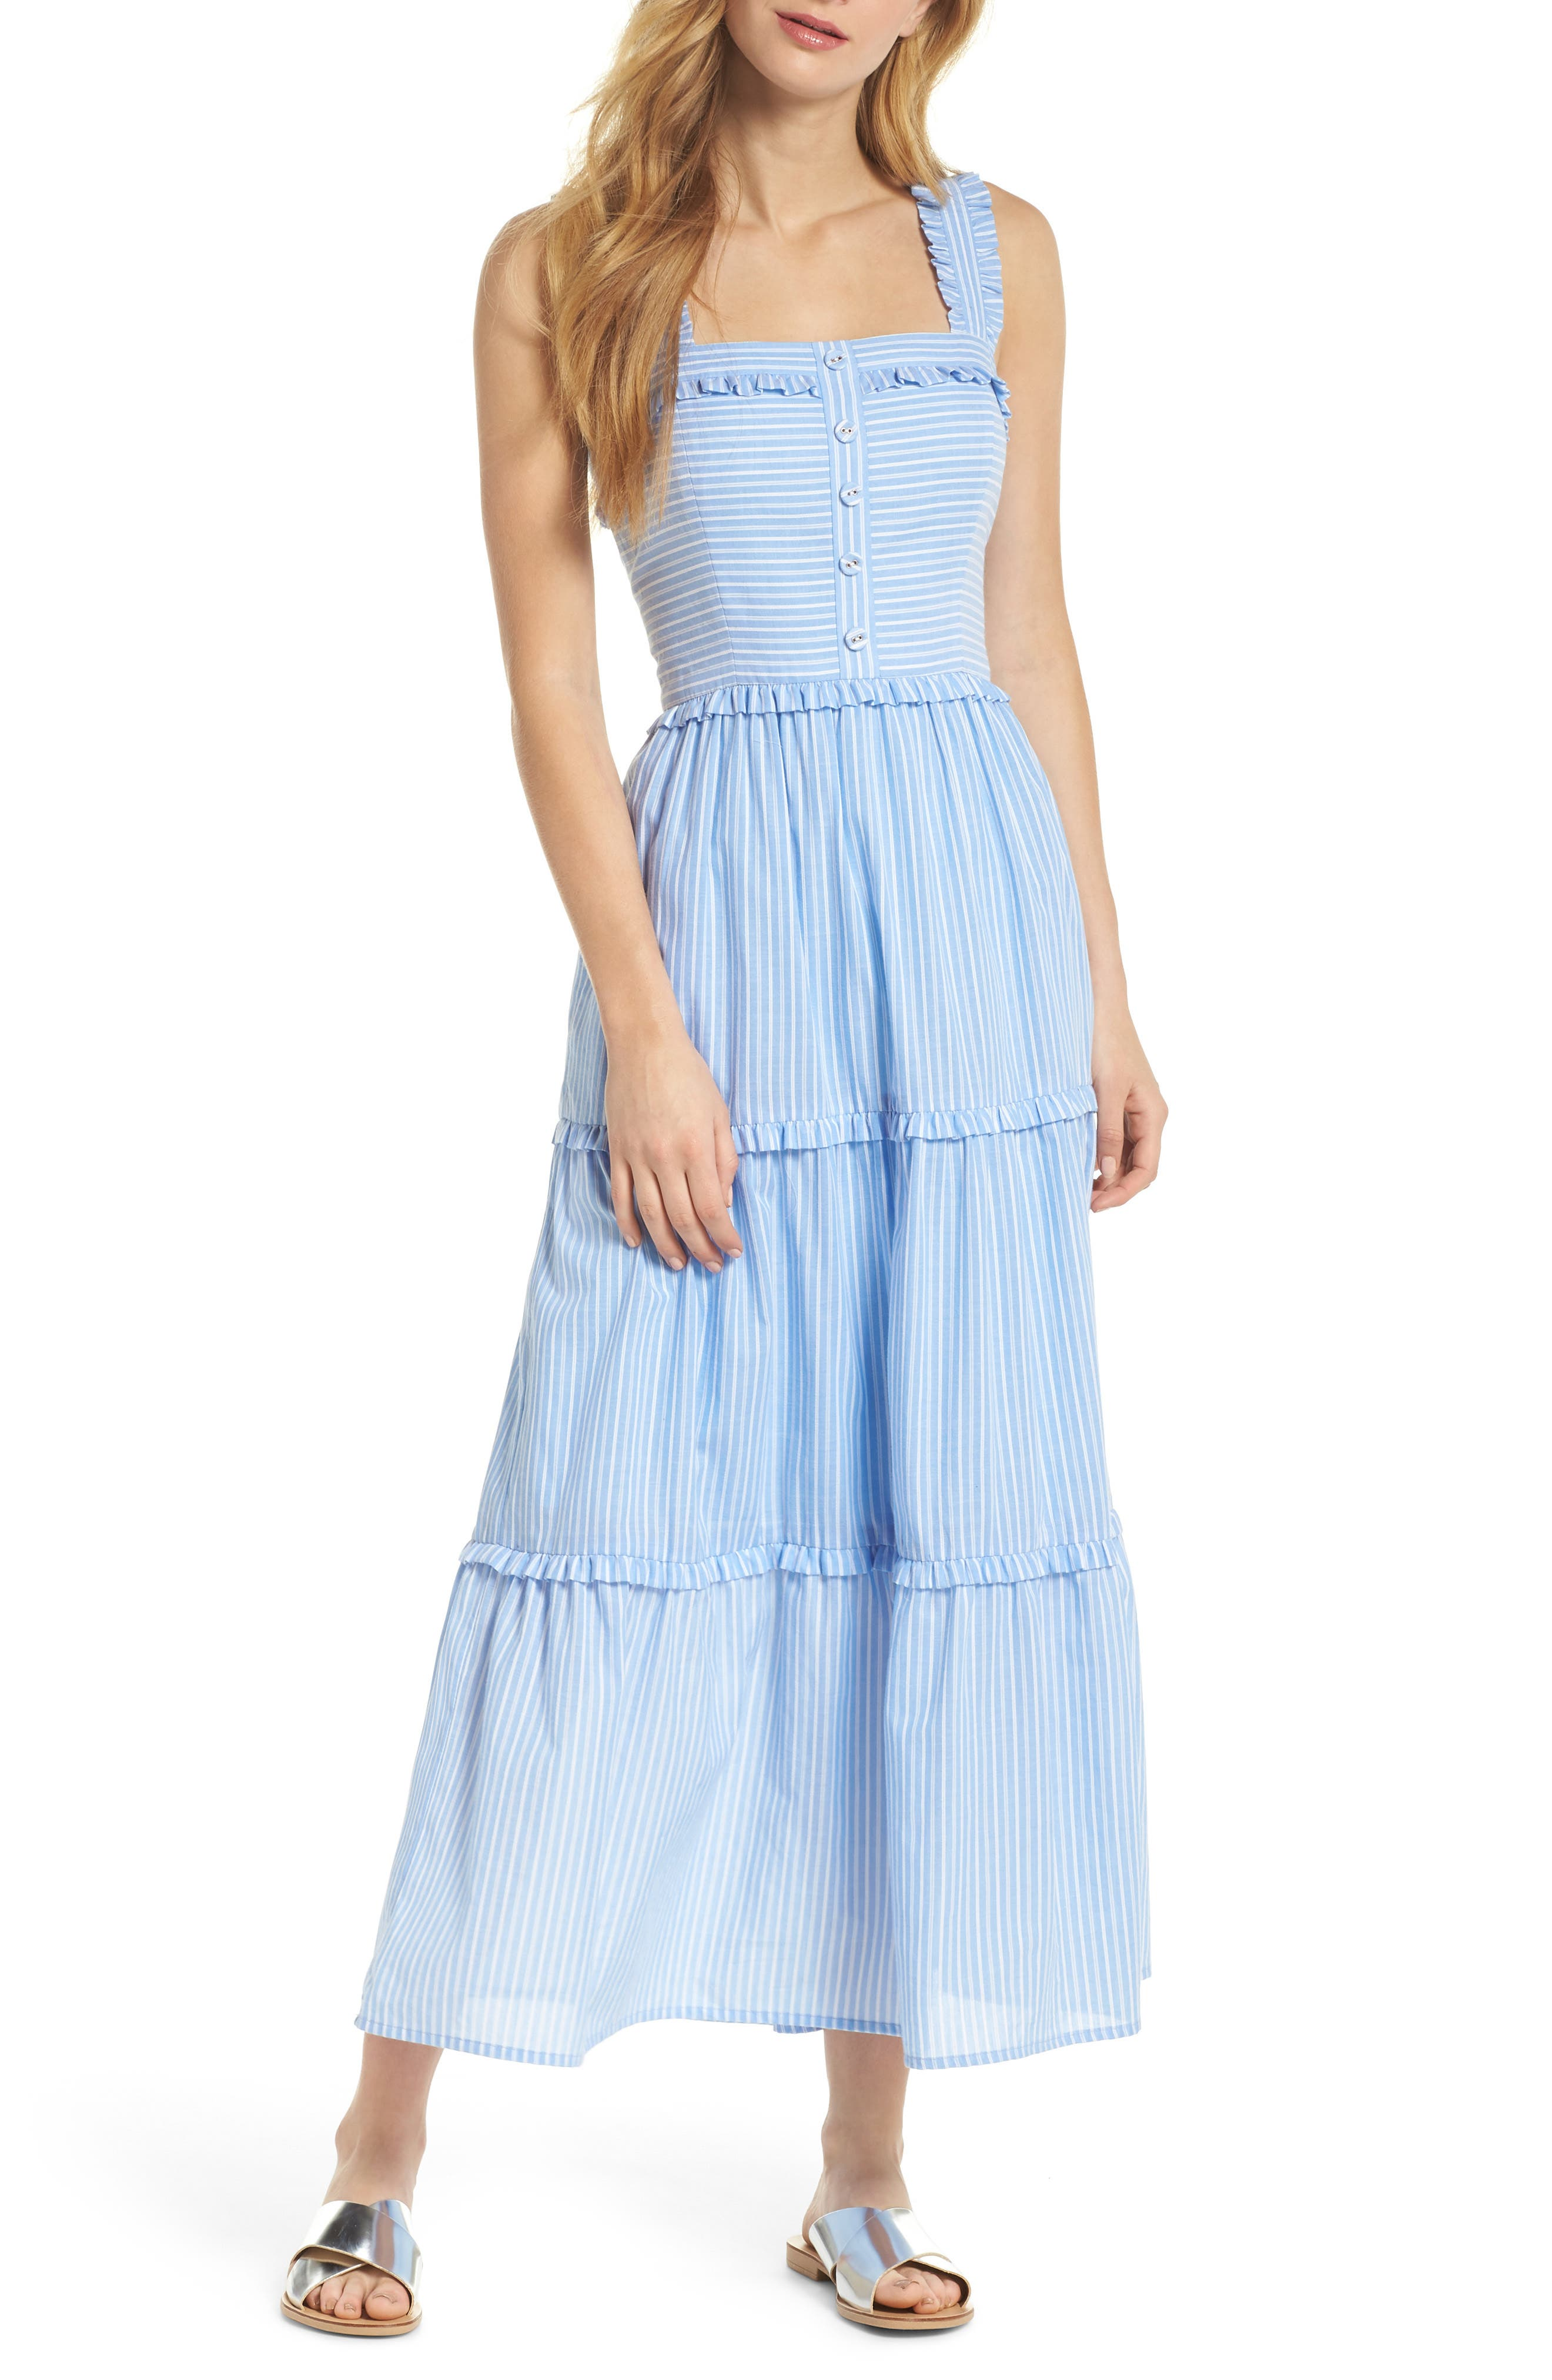 Courtney Rio Stripe Lawn Maxi Dress,                         Main,                         color, Blue/ White